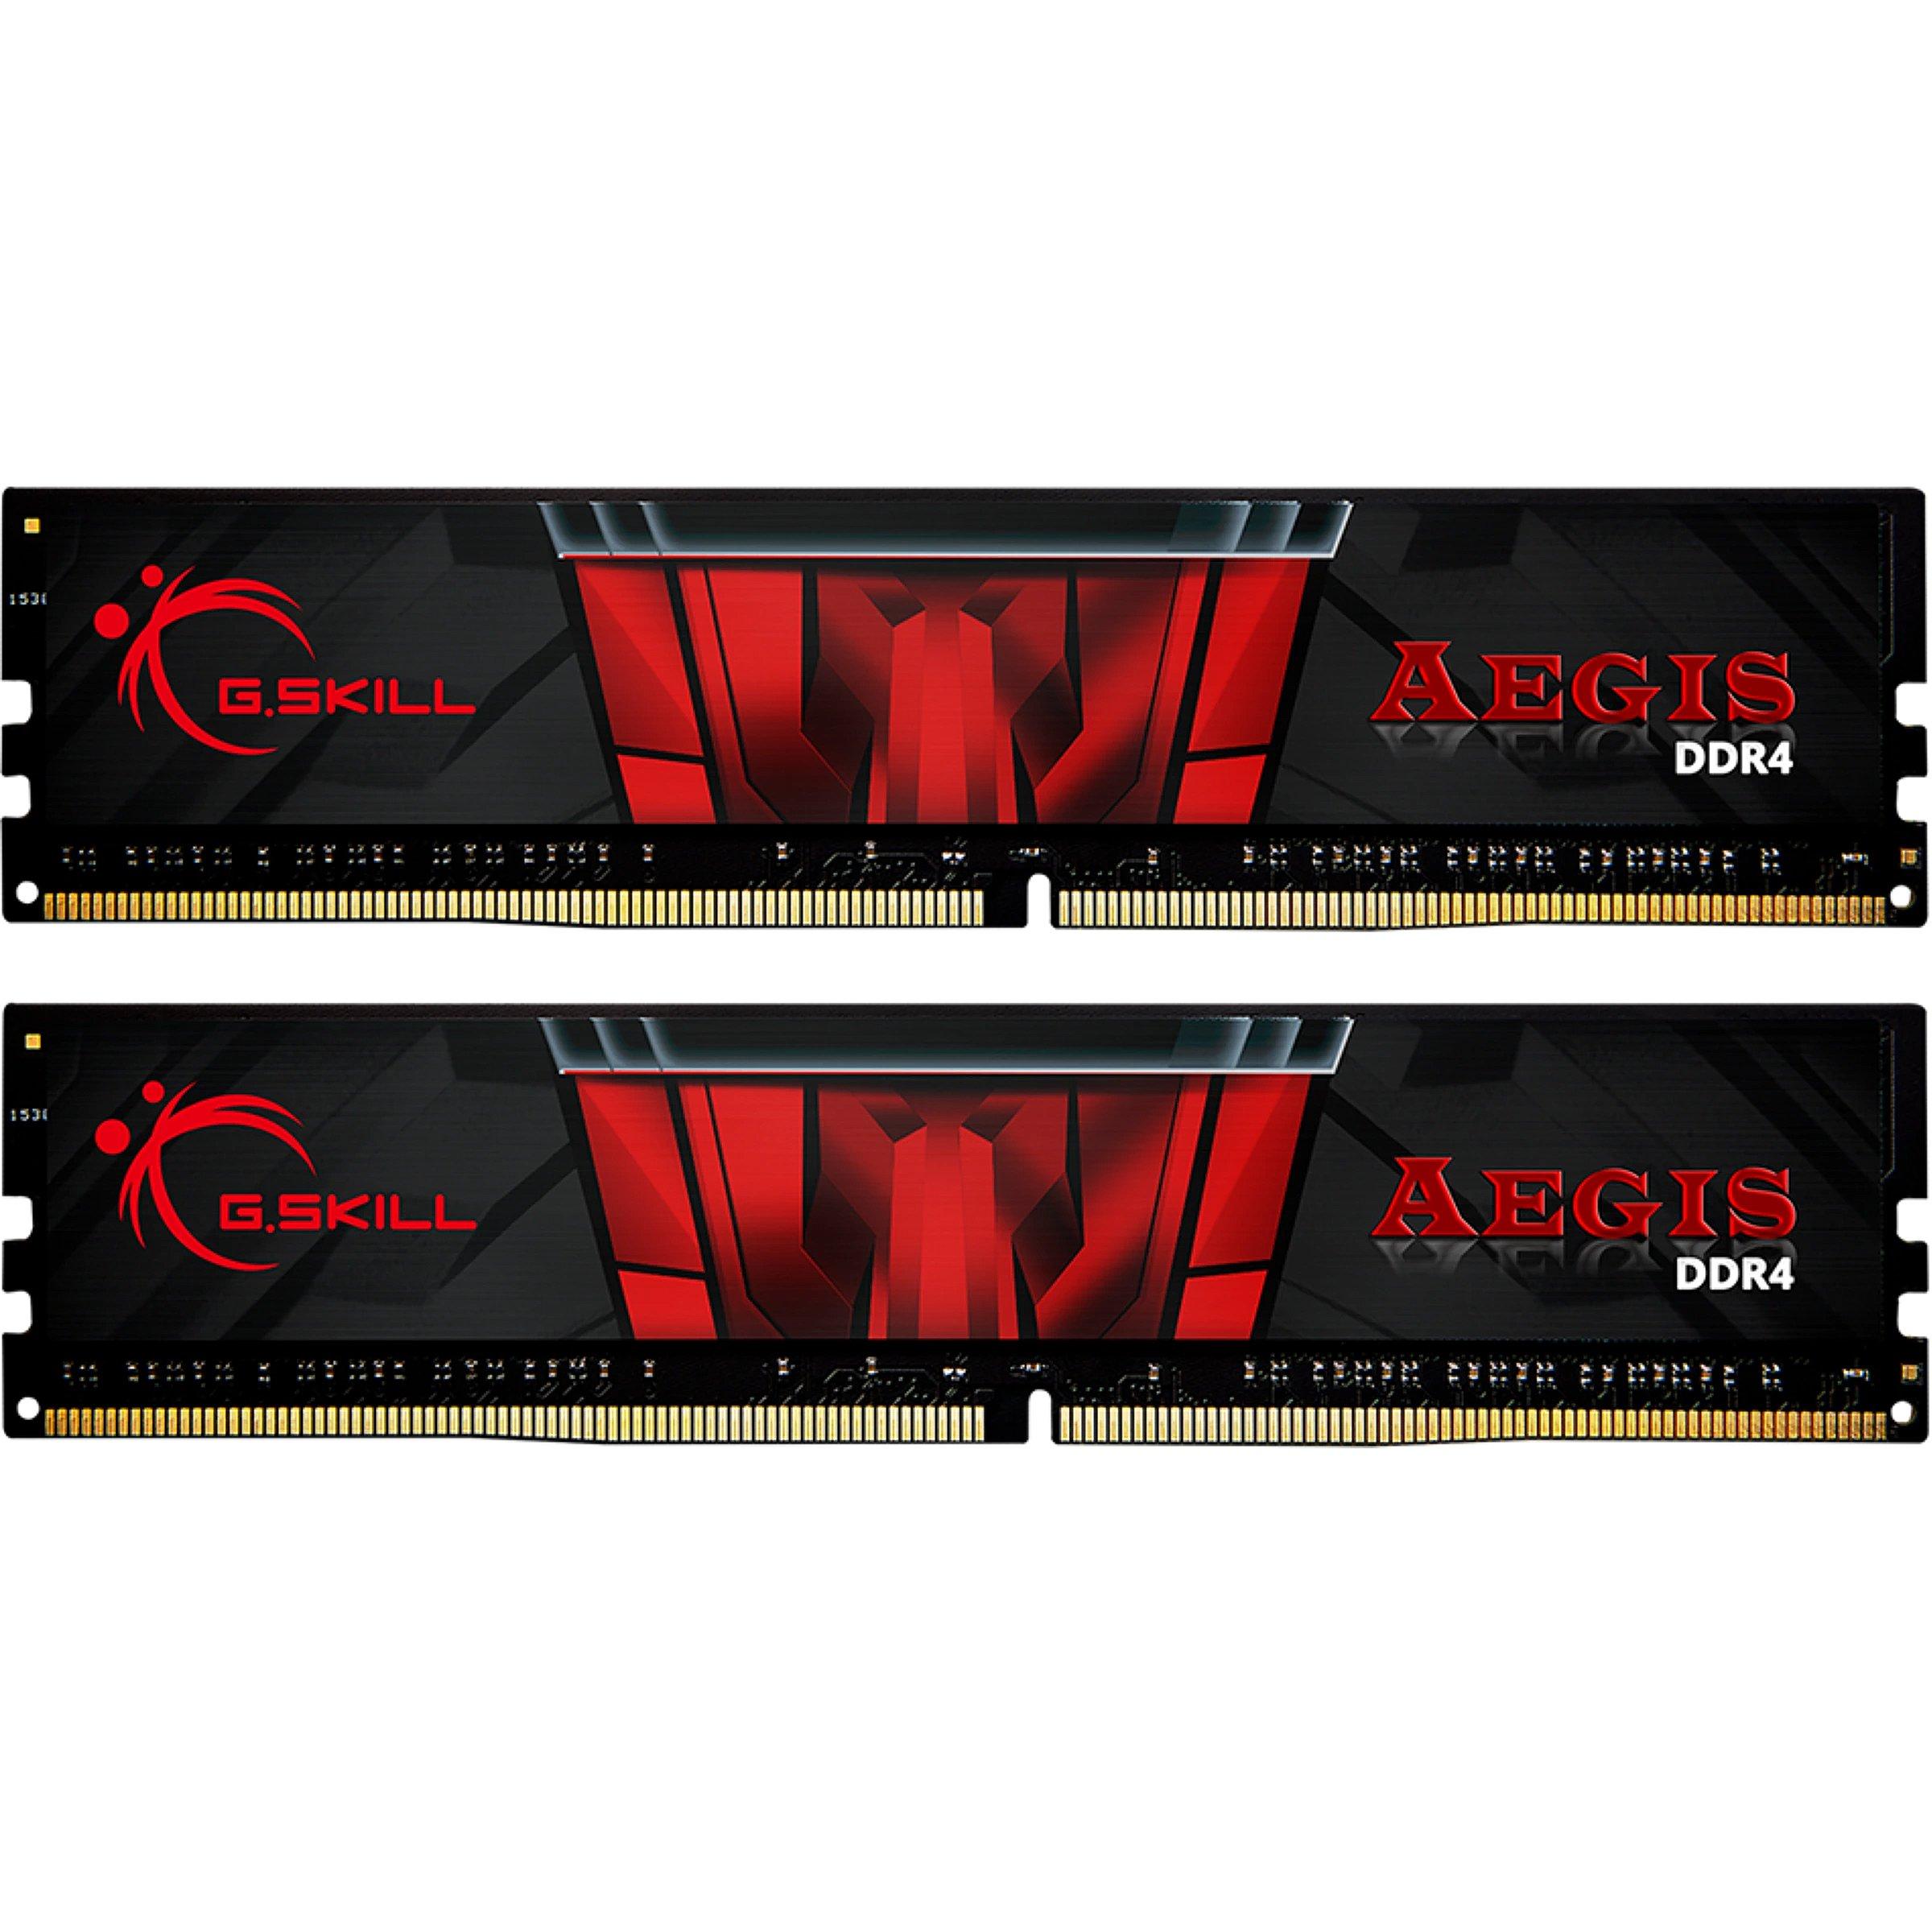 G.SKILL Aegis, DDR4, 16GB, 3200MHz, CL16, Kit of 2